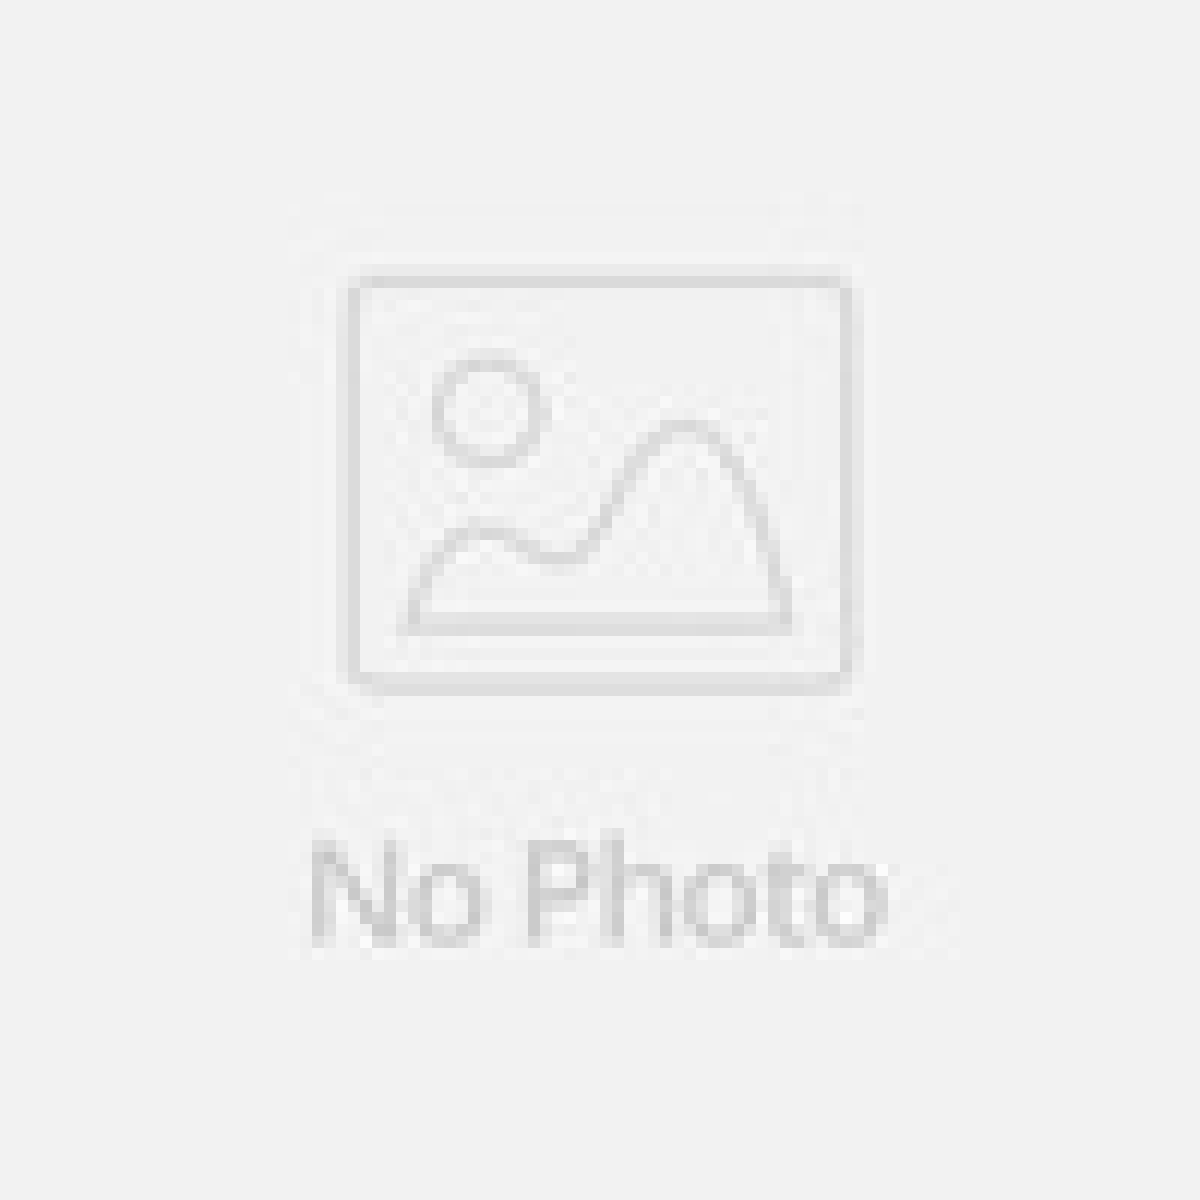 Maternity Wedding Dress Rental Gallery - Braidsmaid Dress, Cocktail ...